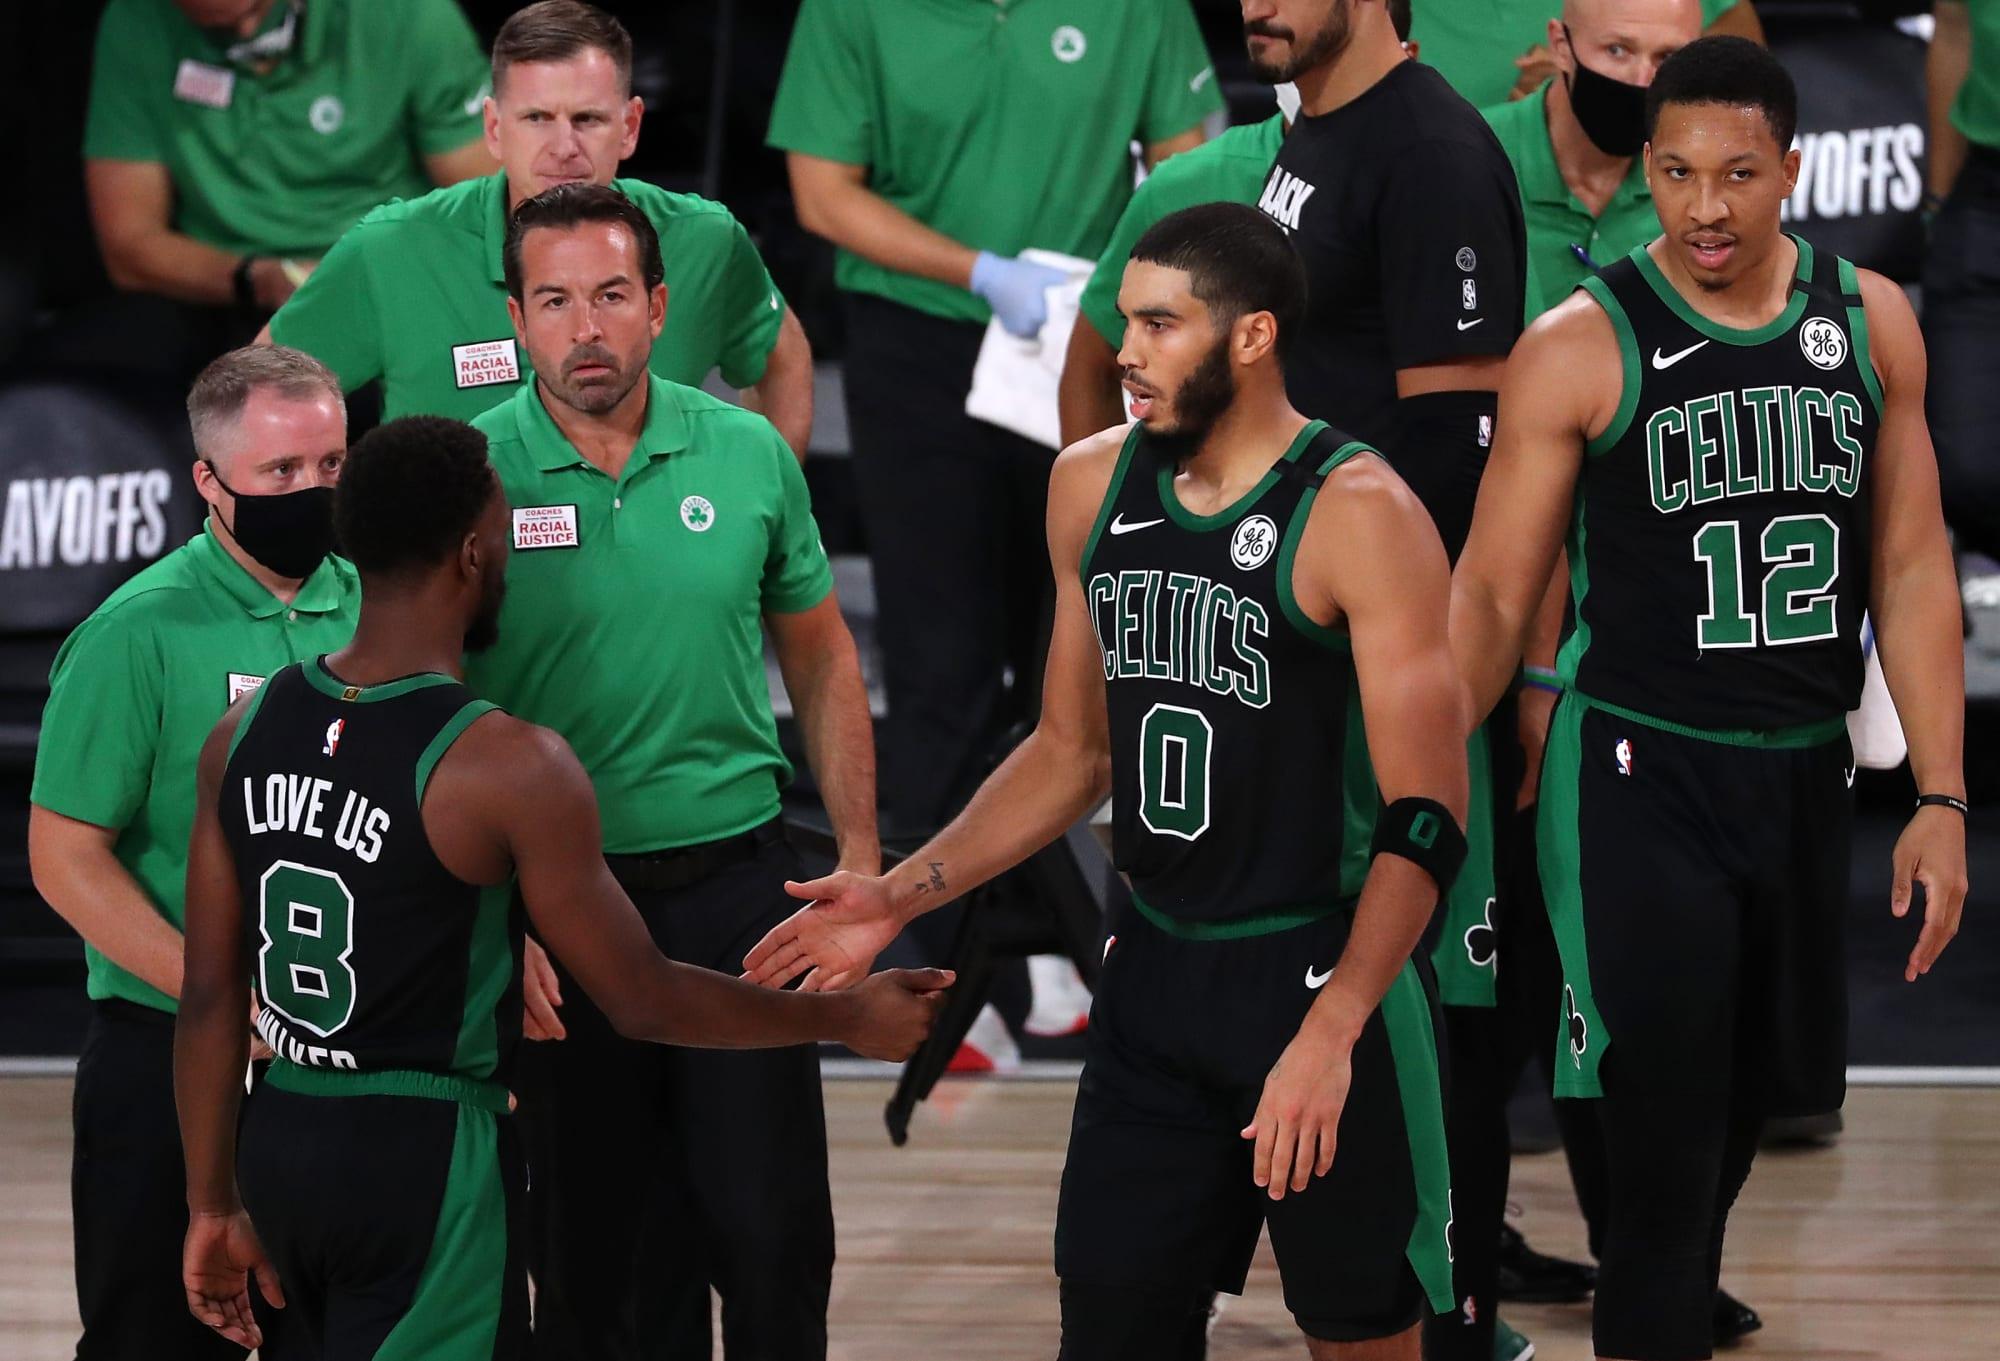 Boston Celtics: No overhaul needed as team builds for 2020-21